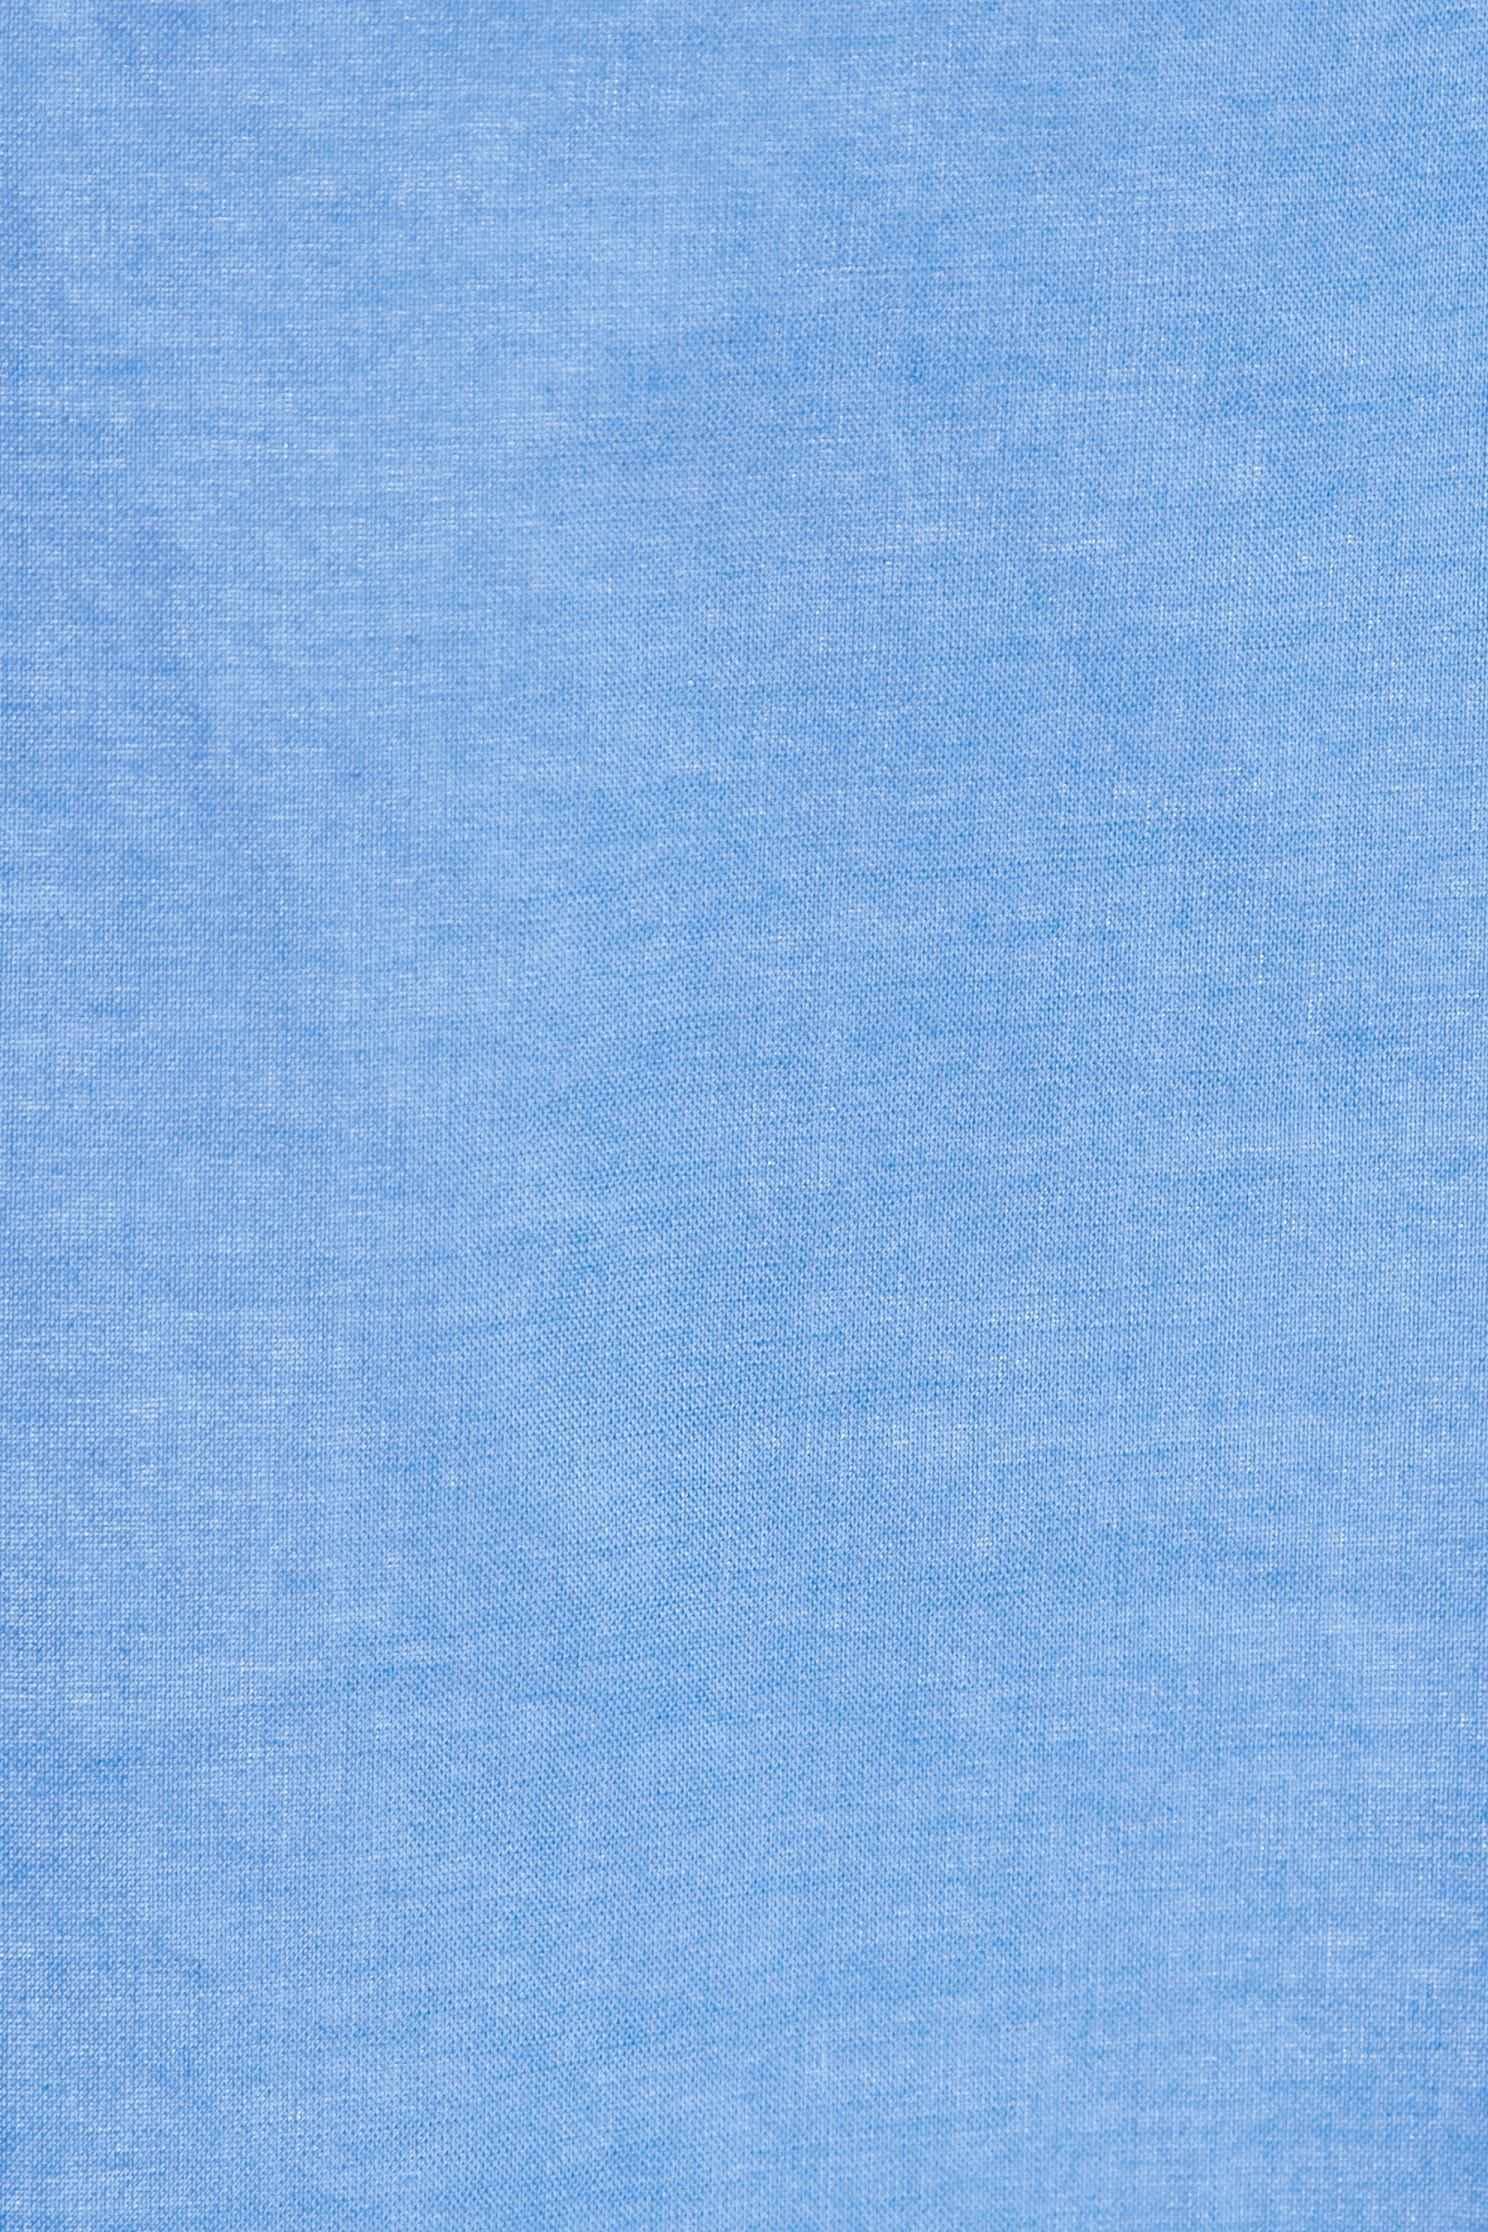 Blue / Pink Svelte Dress,top,shouldertop,cotton,blouse,longsleevetop